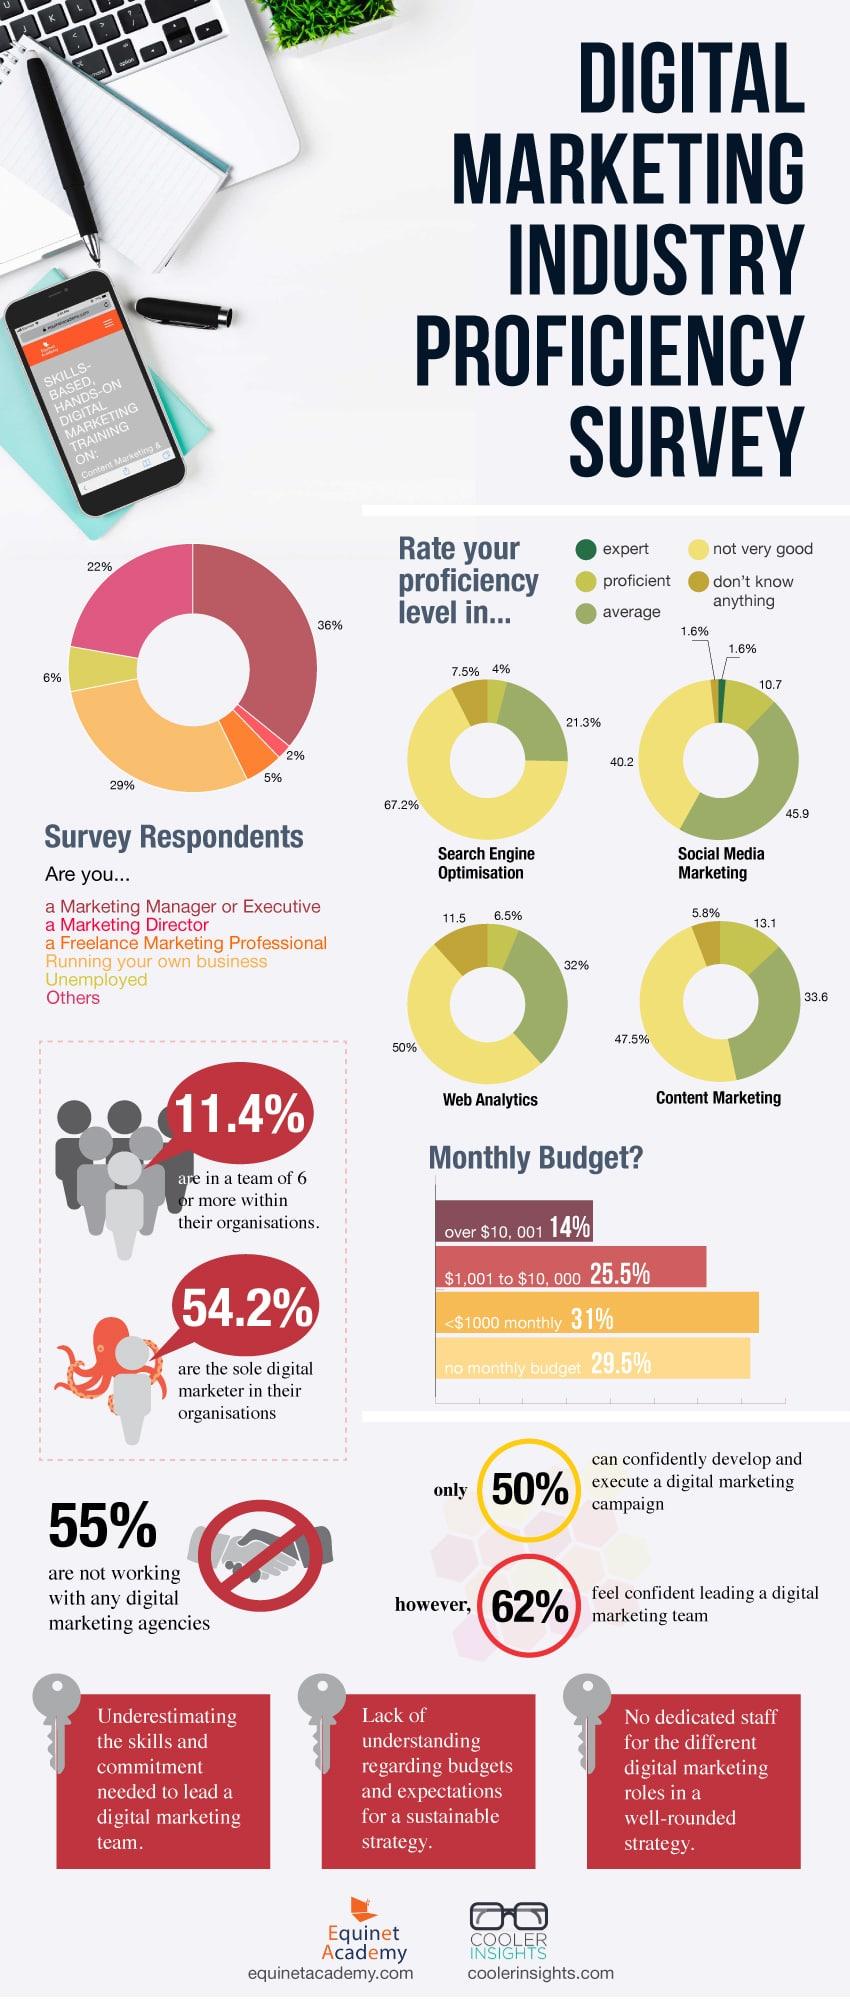 Infographic Digital Marketing Industry Proficiency Survey Statistics Singapore 2018